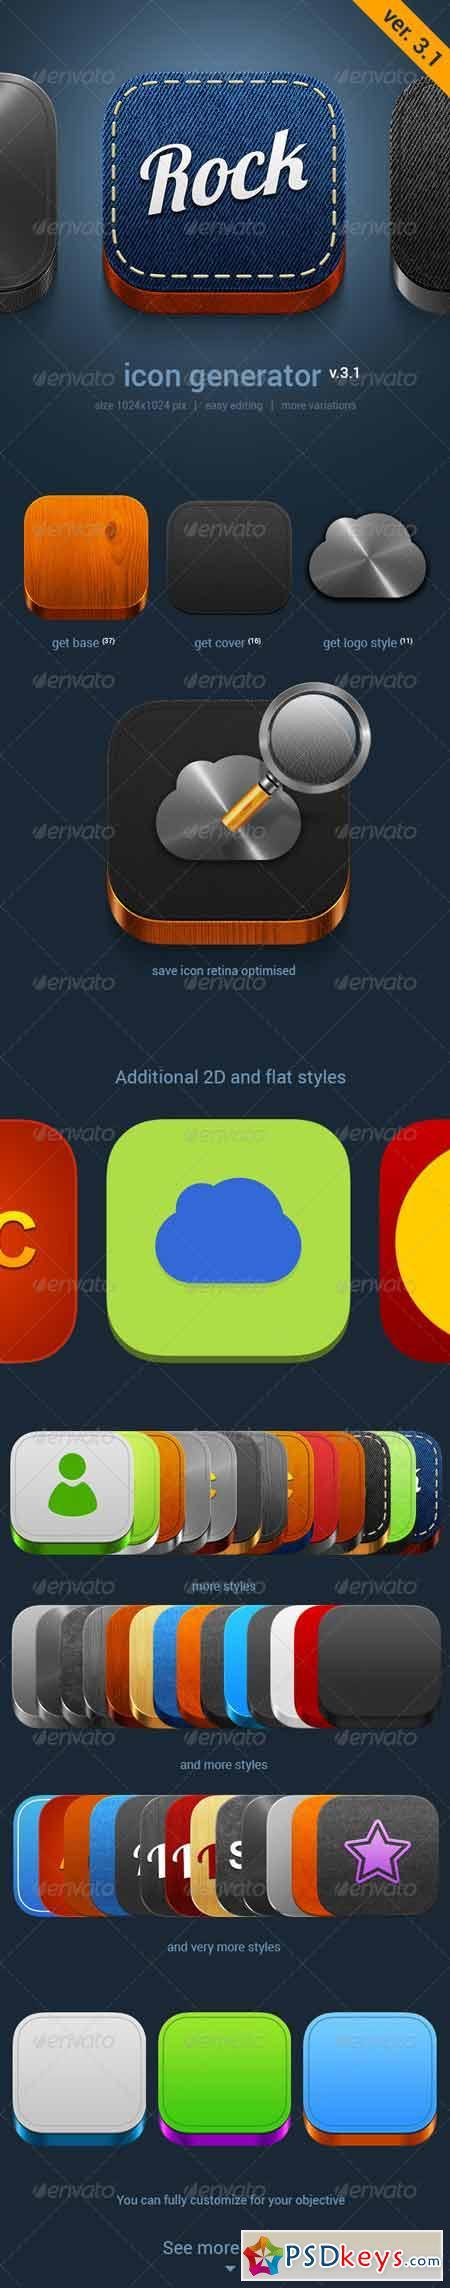 App Icon Generator V.3.2 6654272